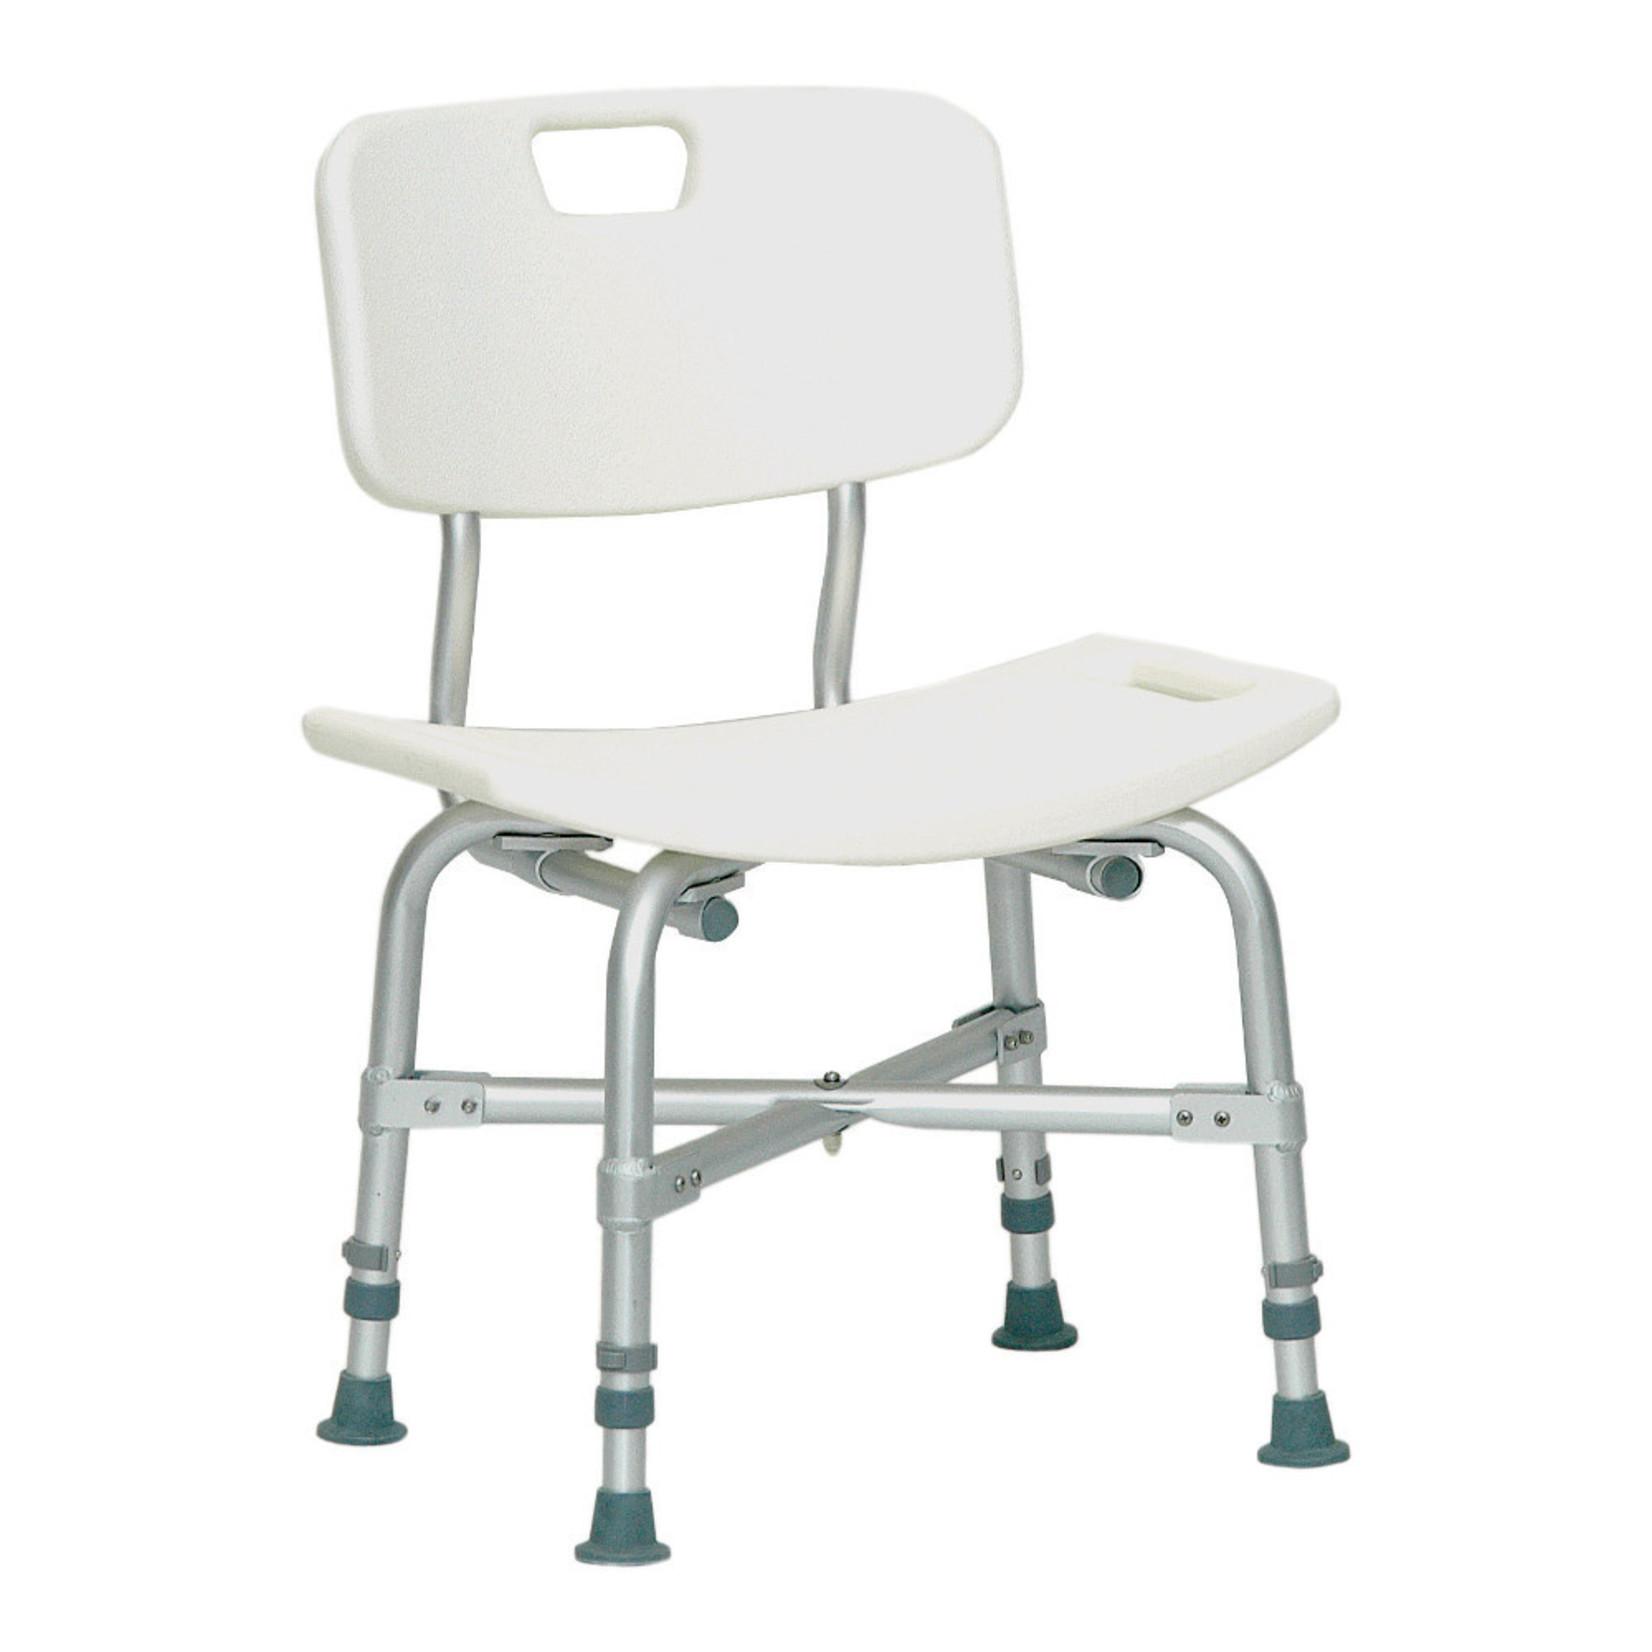 Probasics Shower Chair w/ back - 500 lb